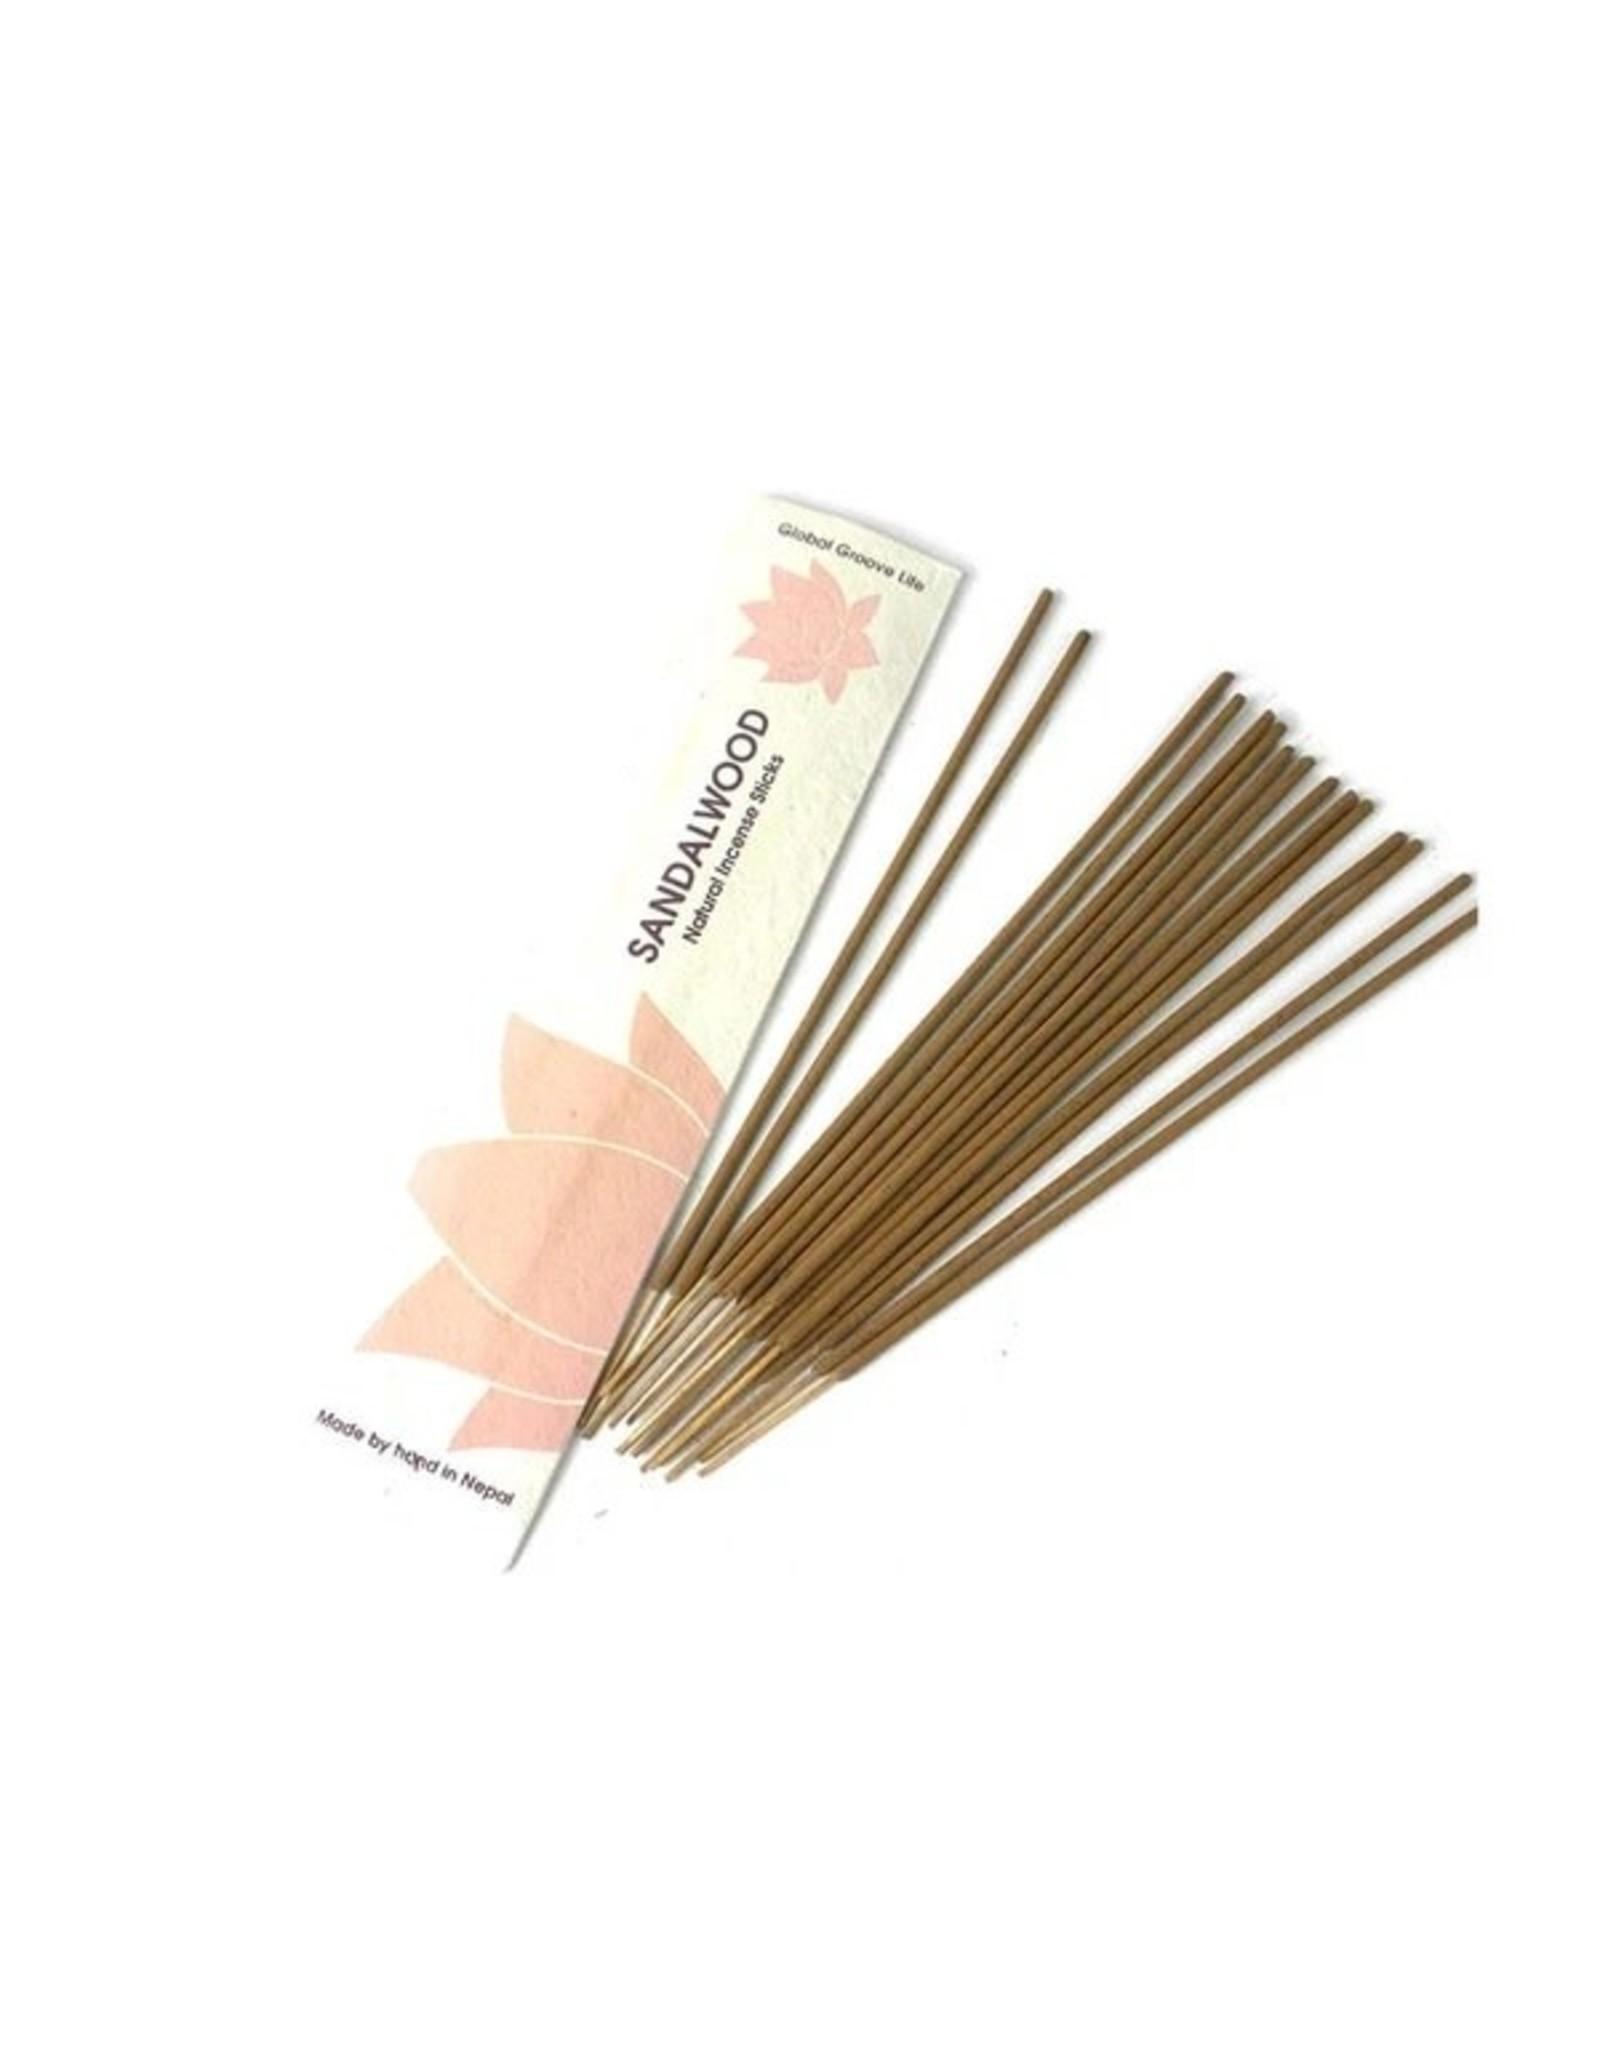 Global Crafts Incense, India